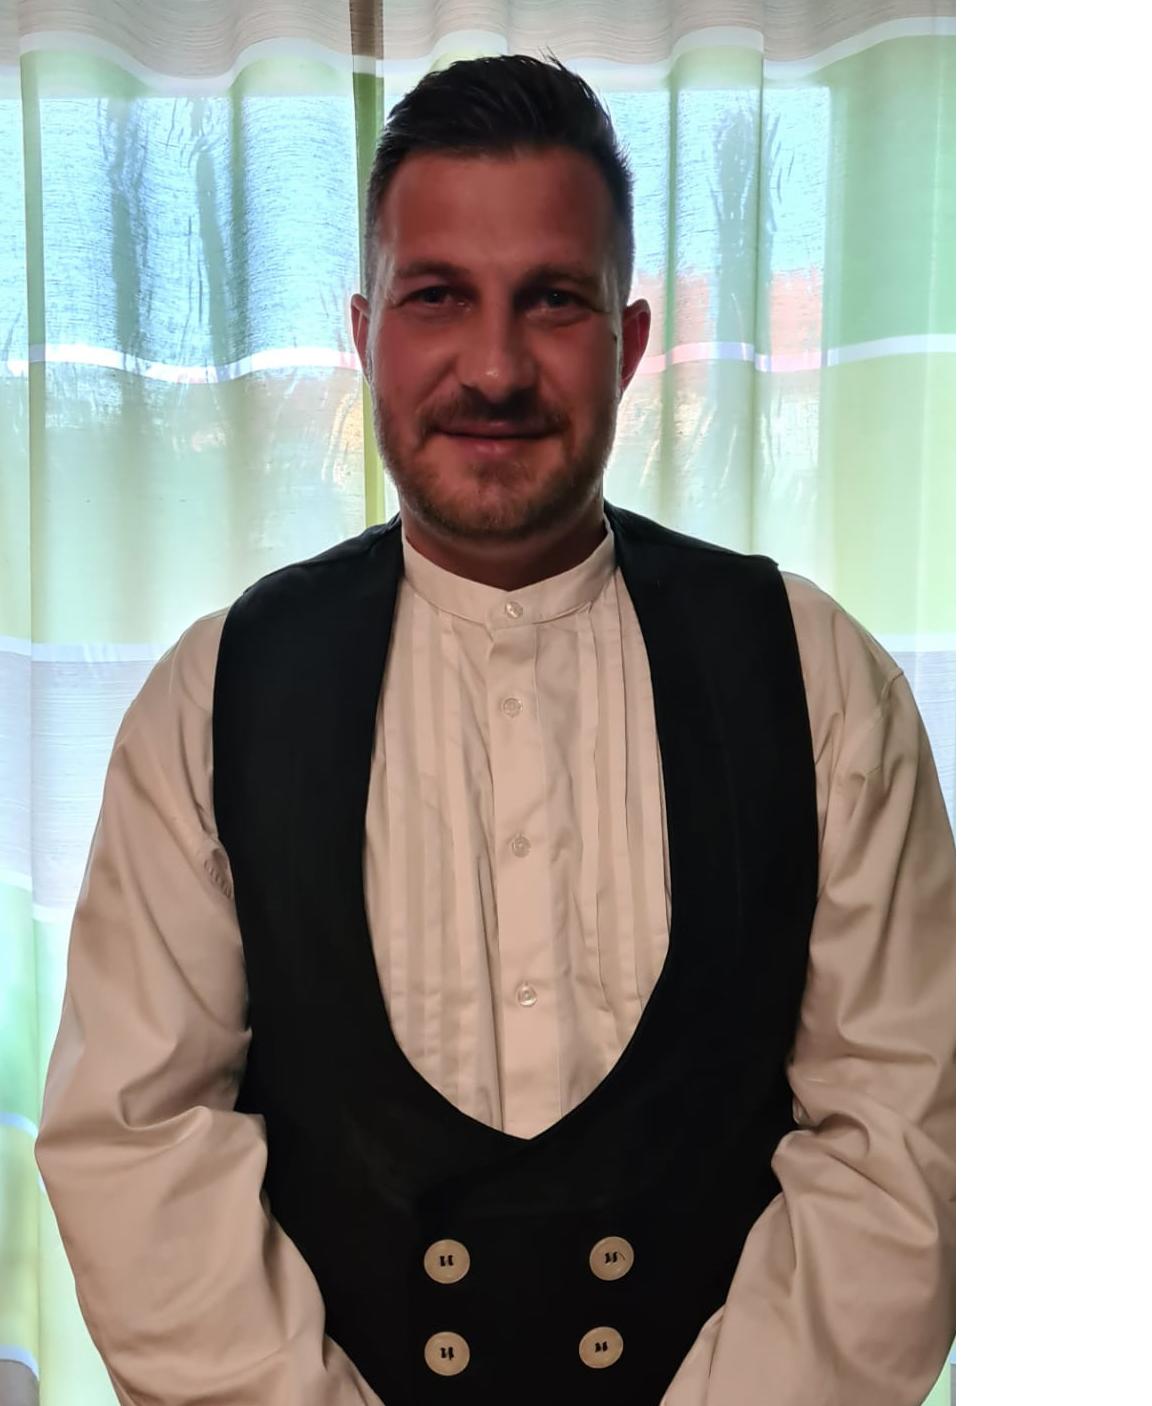 Mario Aleksic-Matic